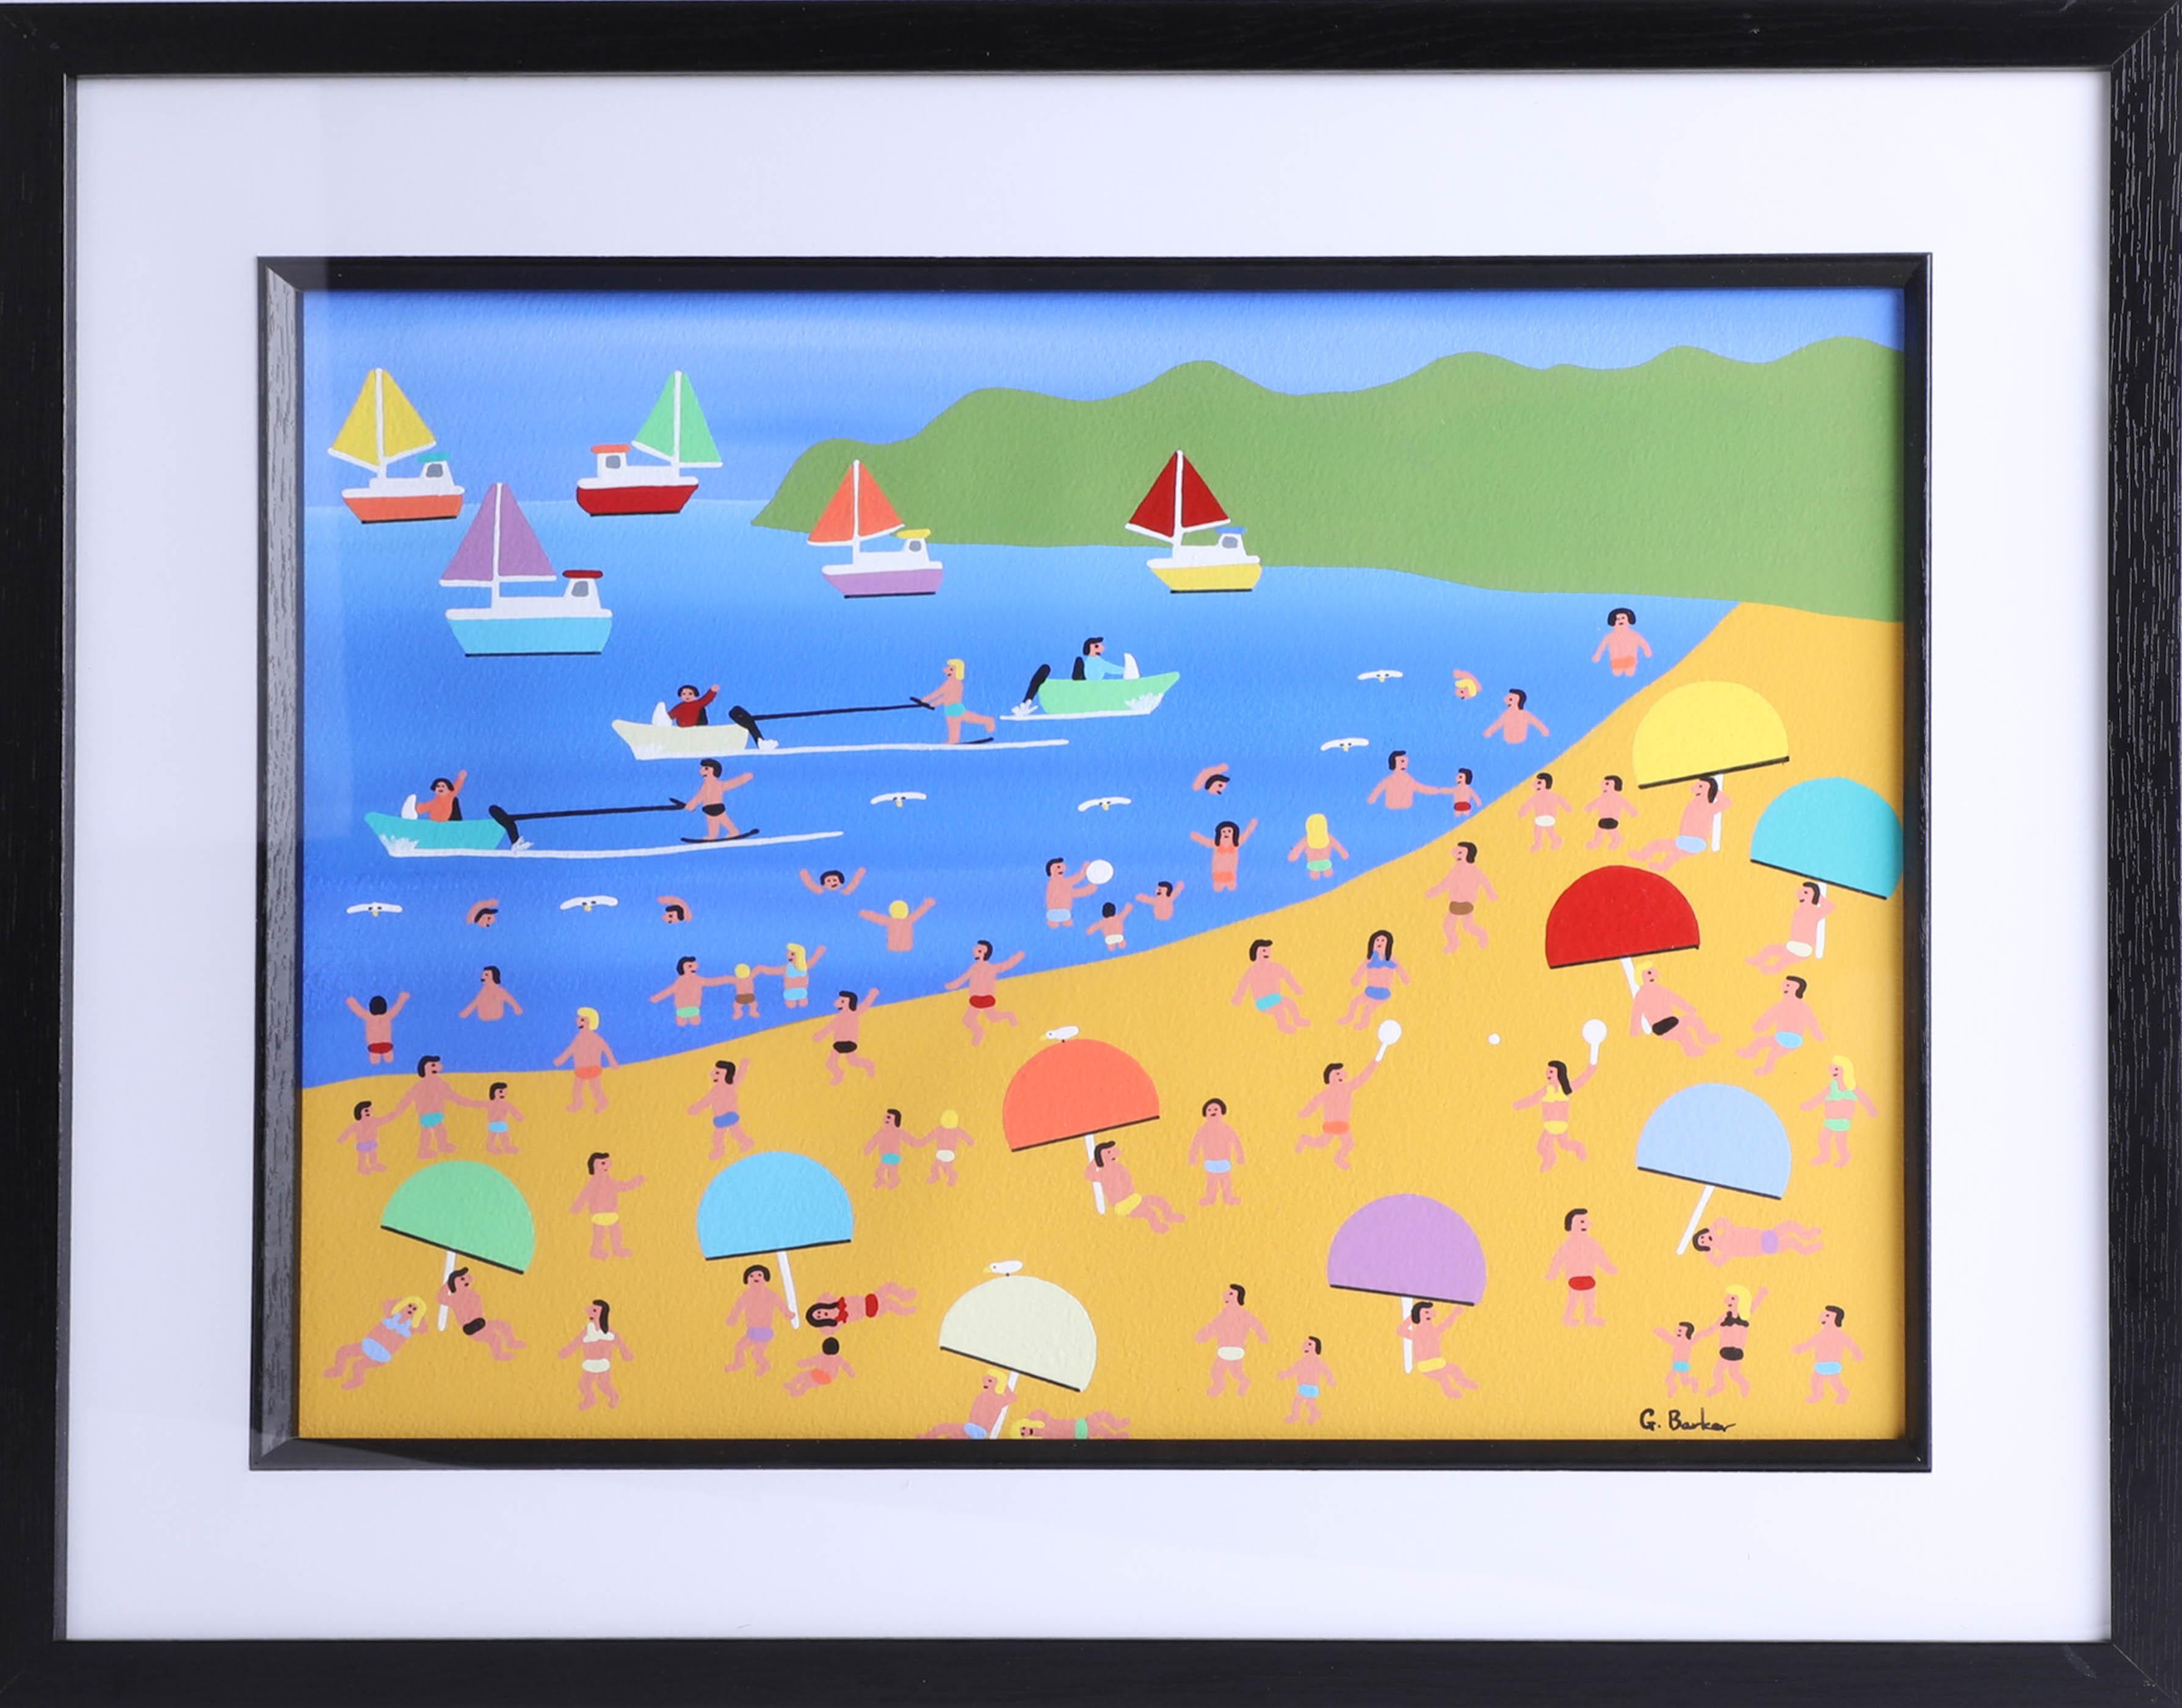 Lot 037 - Gordon Barker, acrylic on paper 'Seaside Holidays', 29cm x 38cm, framed. Gordon Barker is a